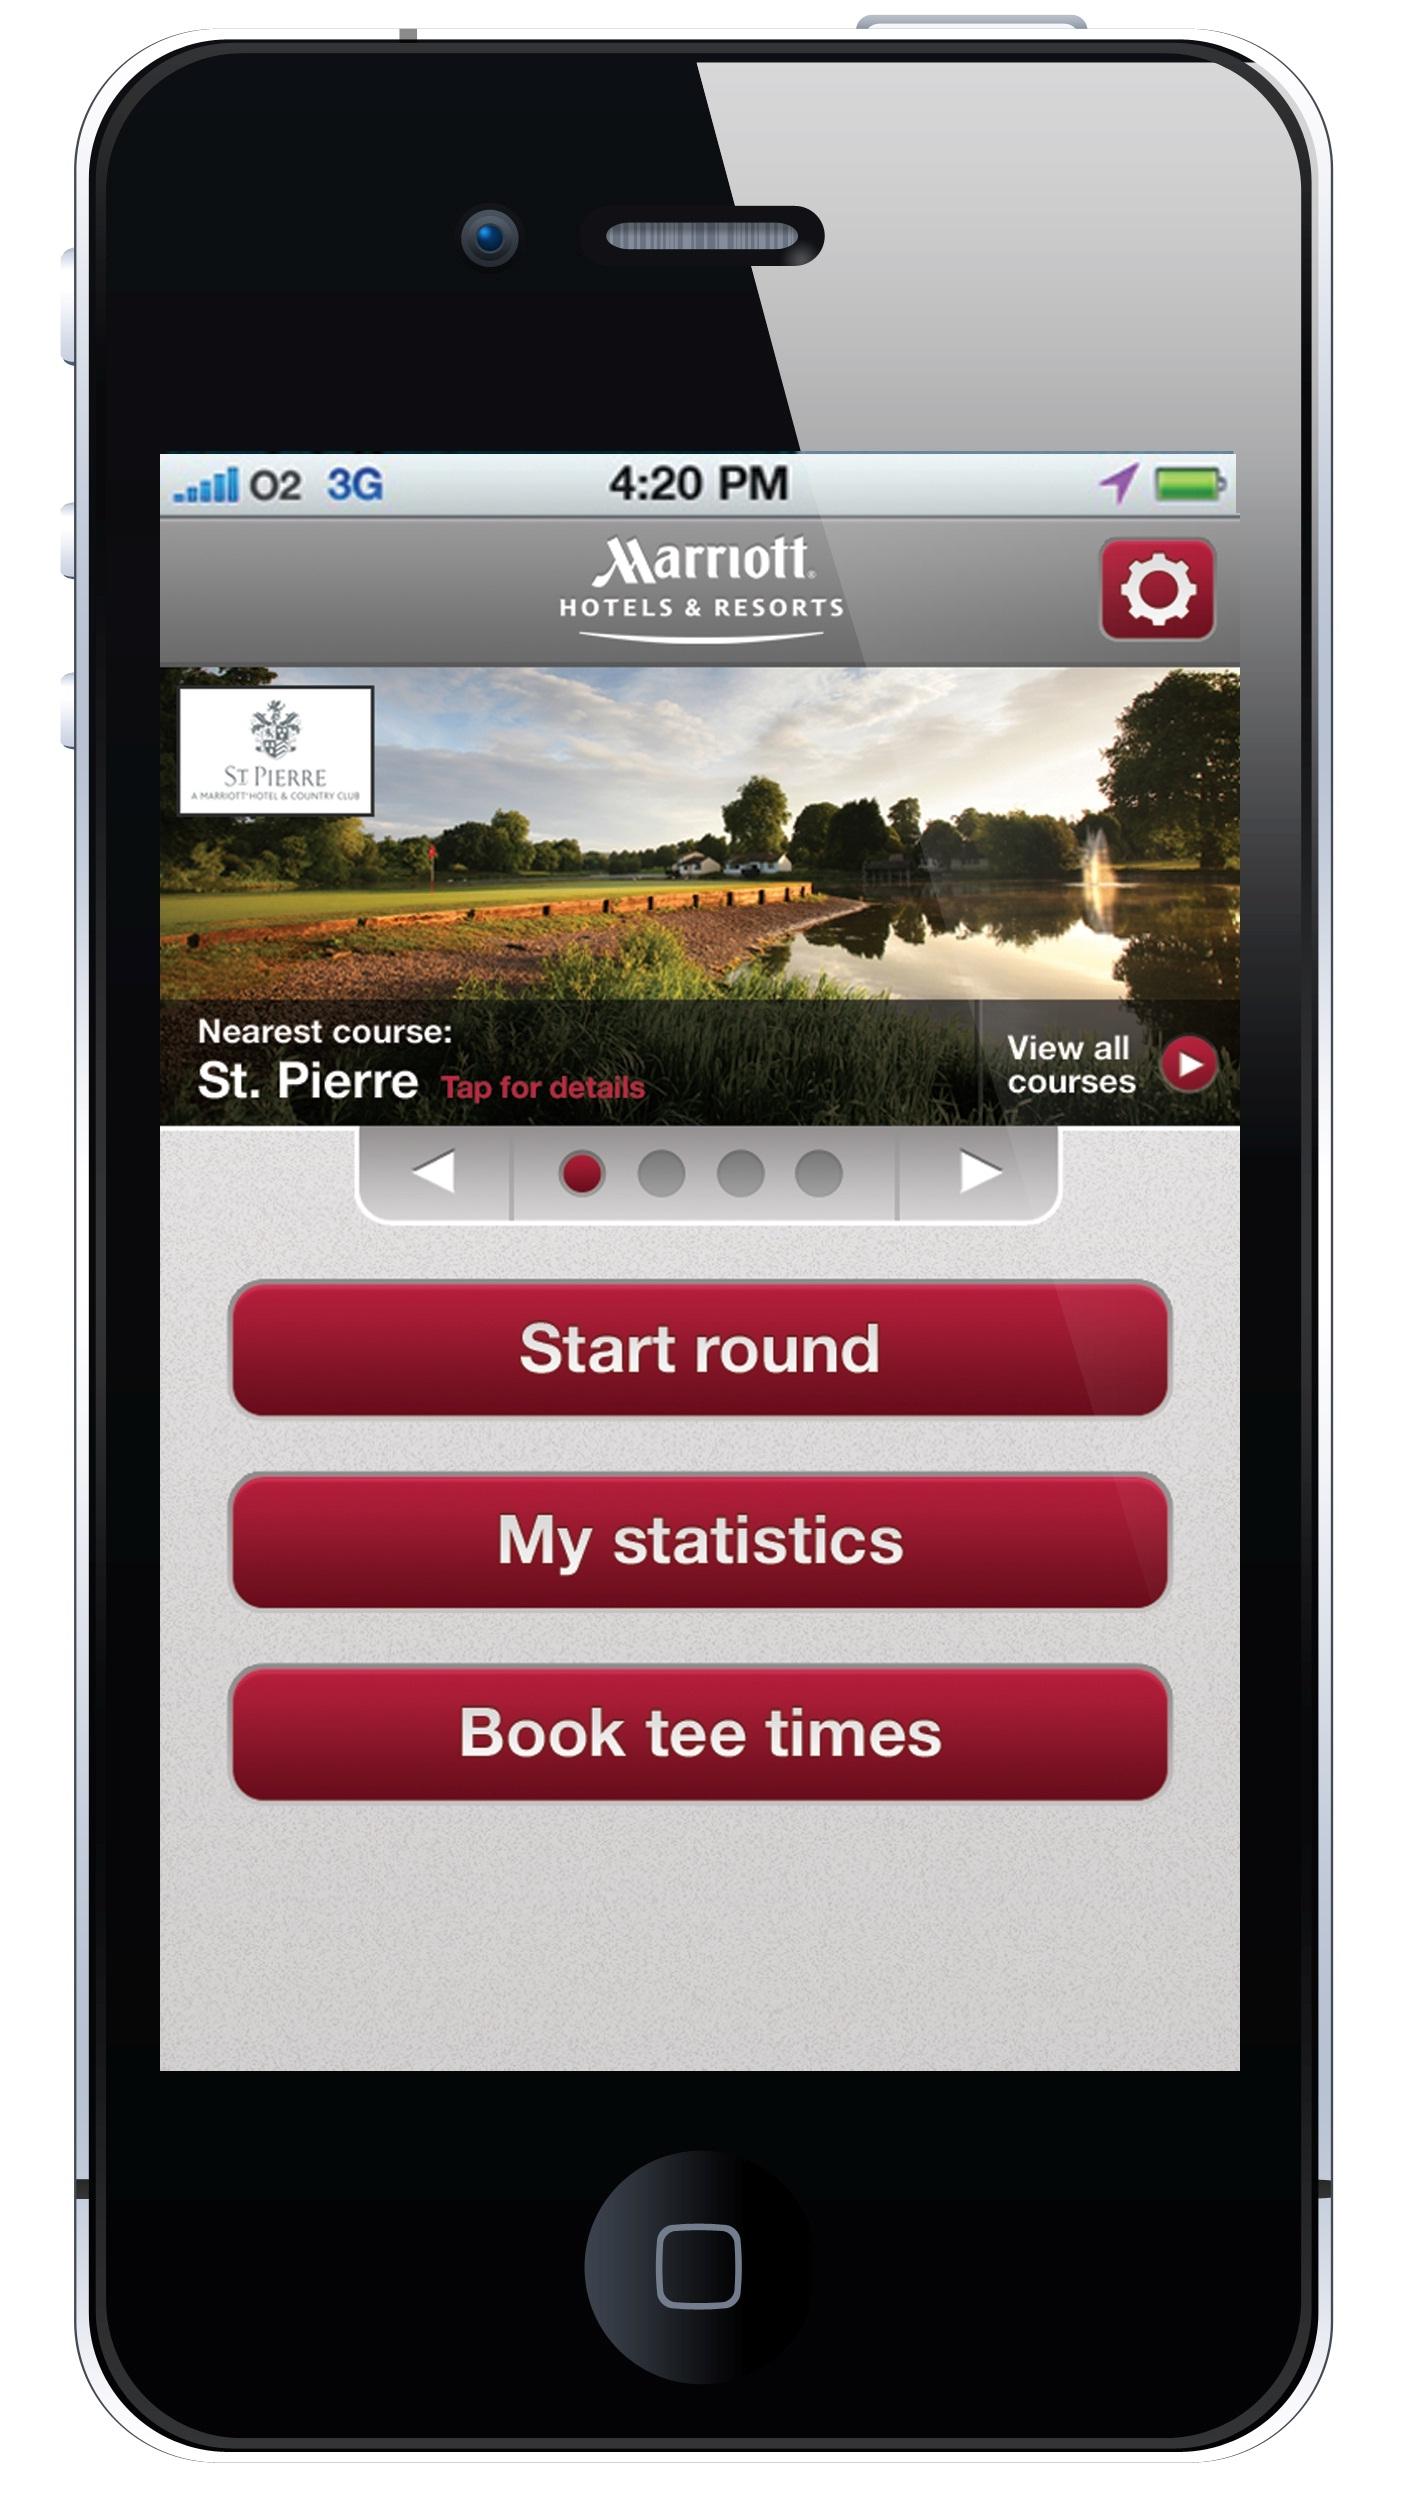 Marriott Golf launches new app